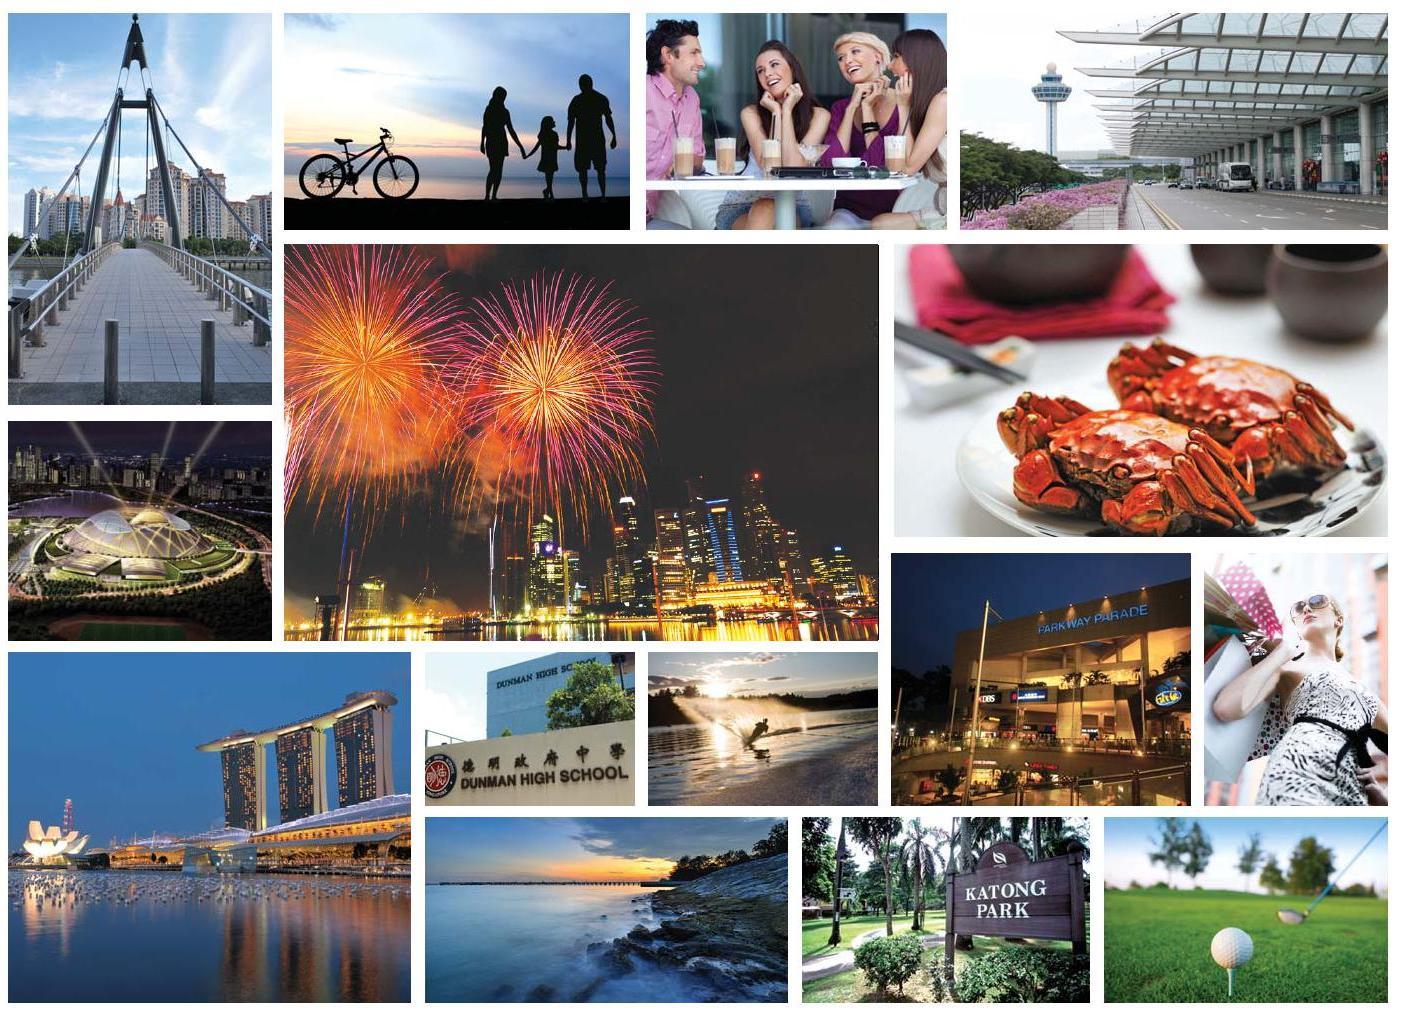 The Line - Tanjong Rhu-Singapore Facilities the line @ tanjong rhu The Line @ Tanjong Rhu Singapore | Showflat Hotline +65 6100 7122 1149 line e brochure FINAL 6